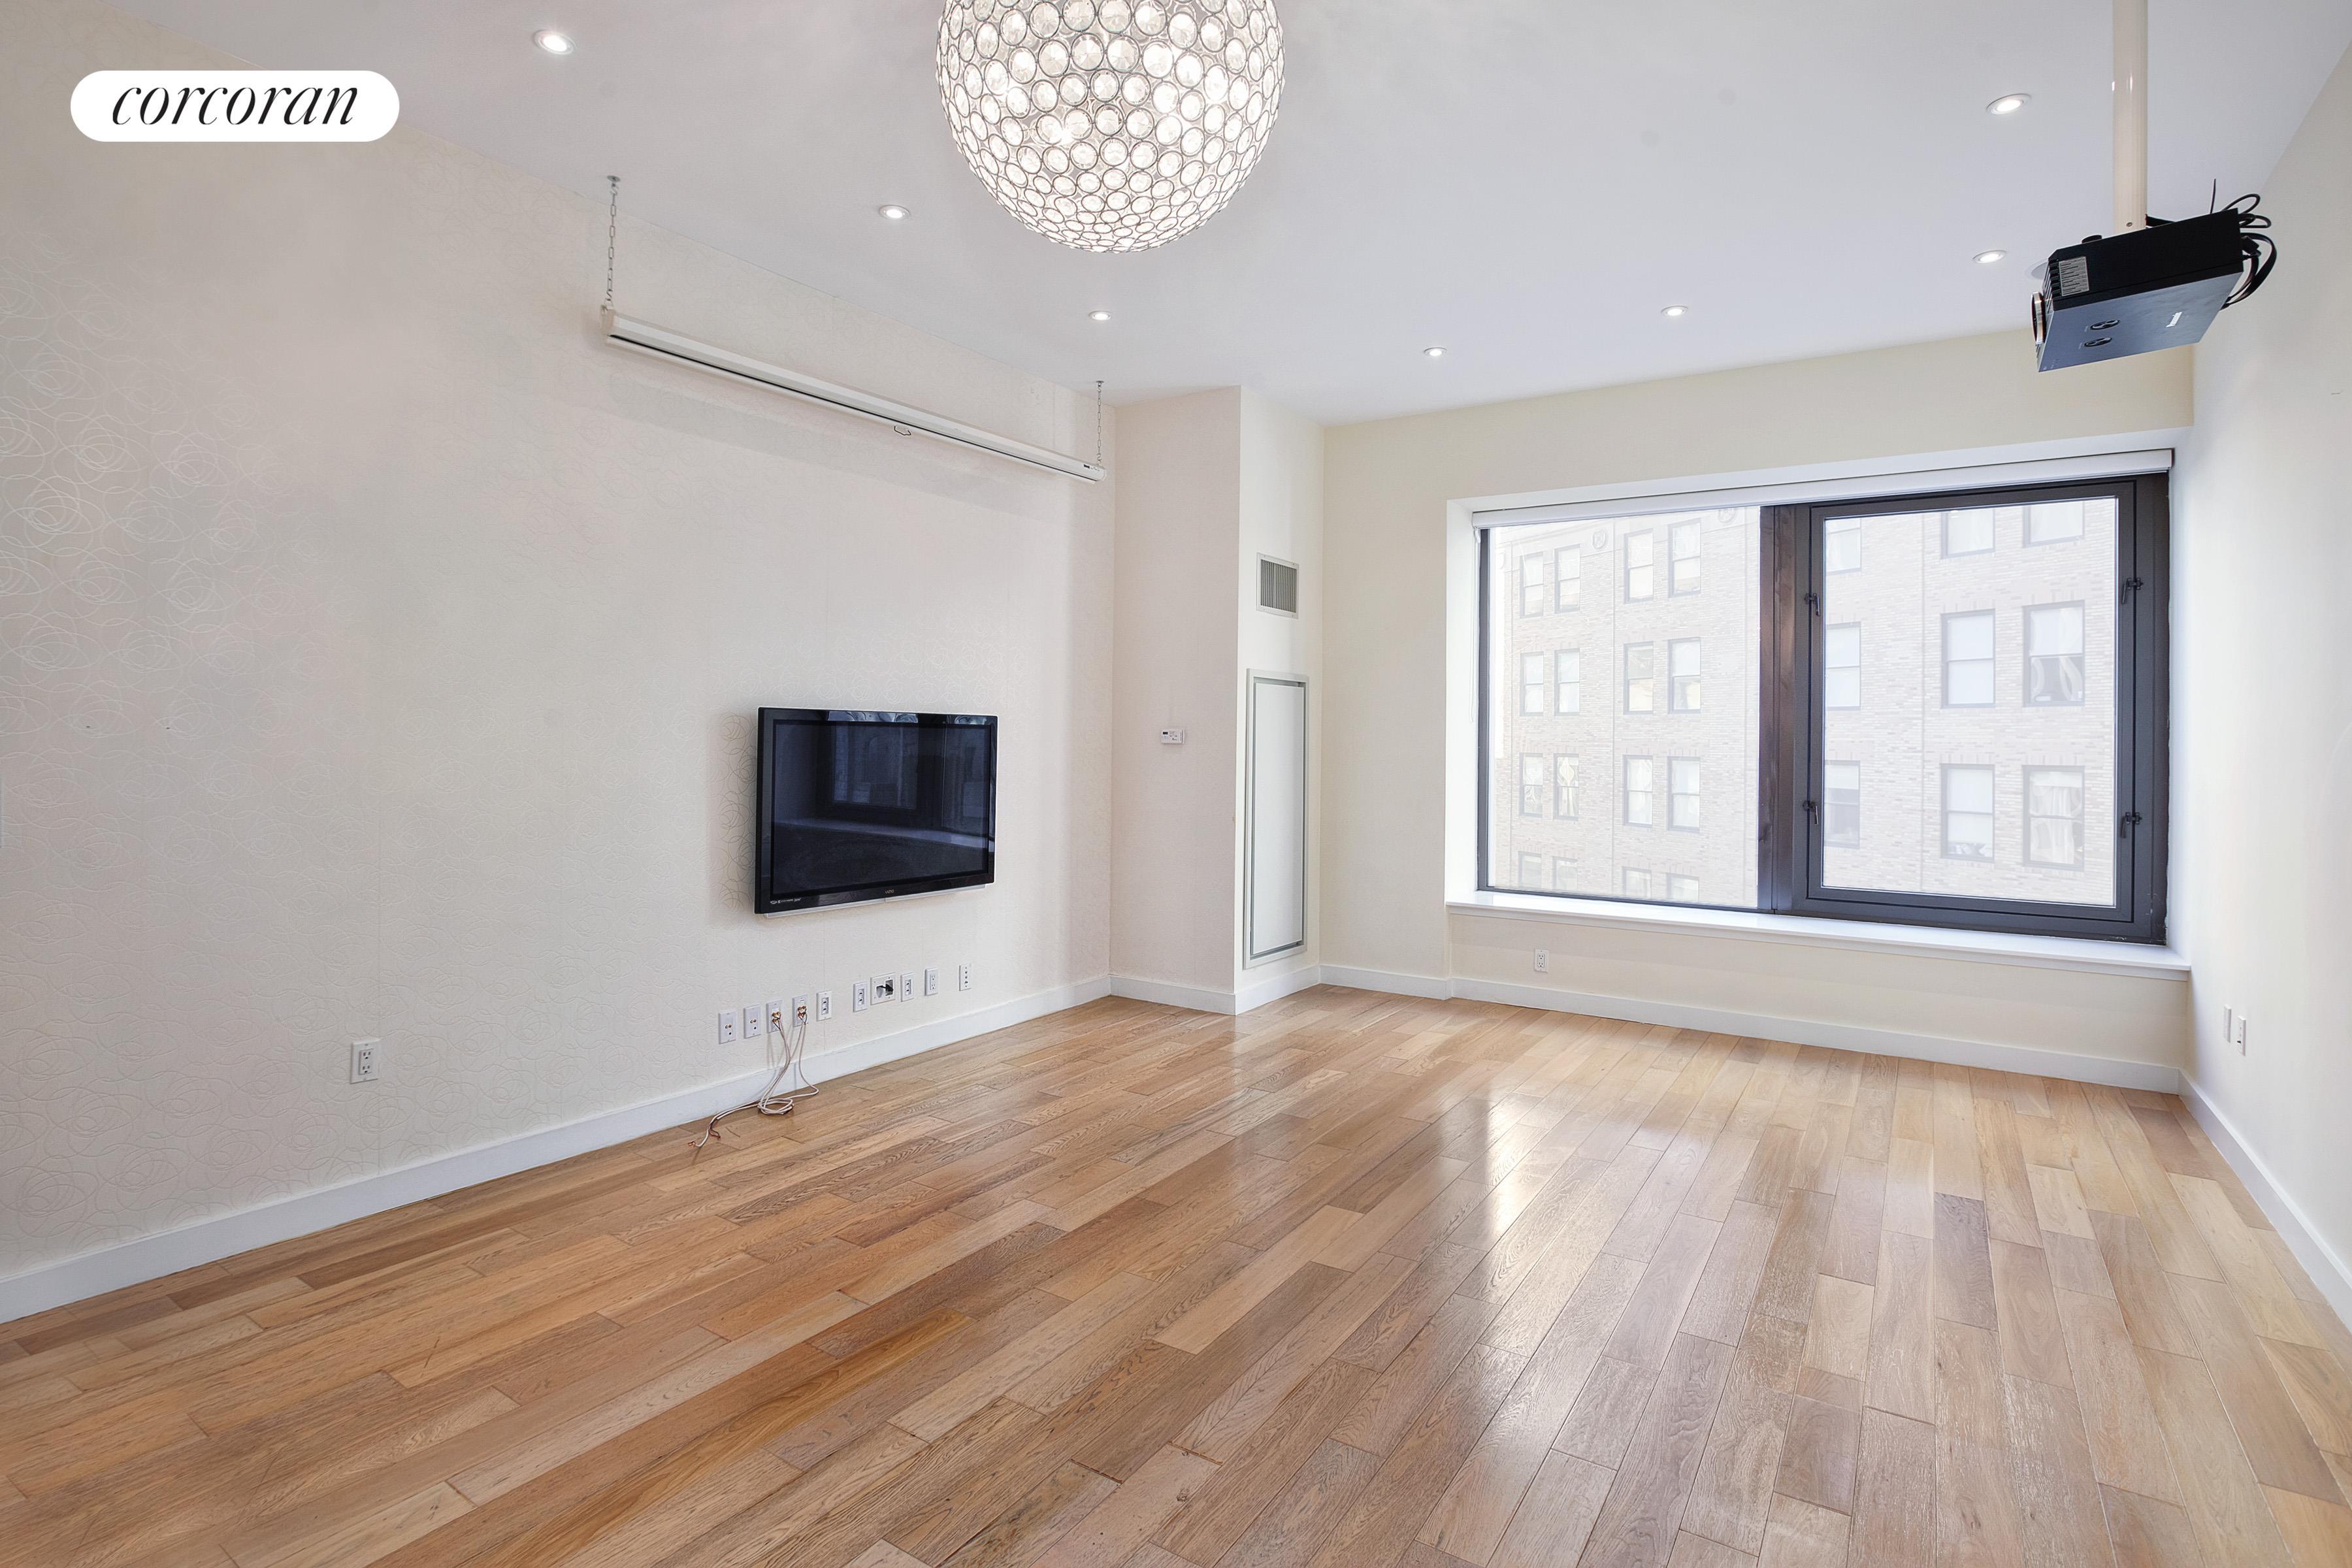 75 Wall Street Financial District New York NY 10005